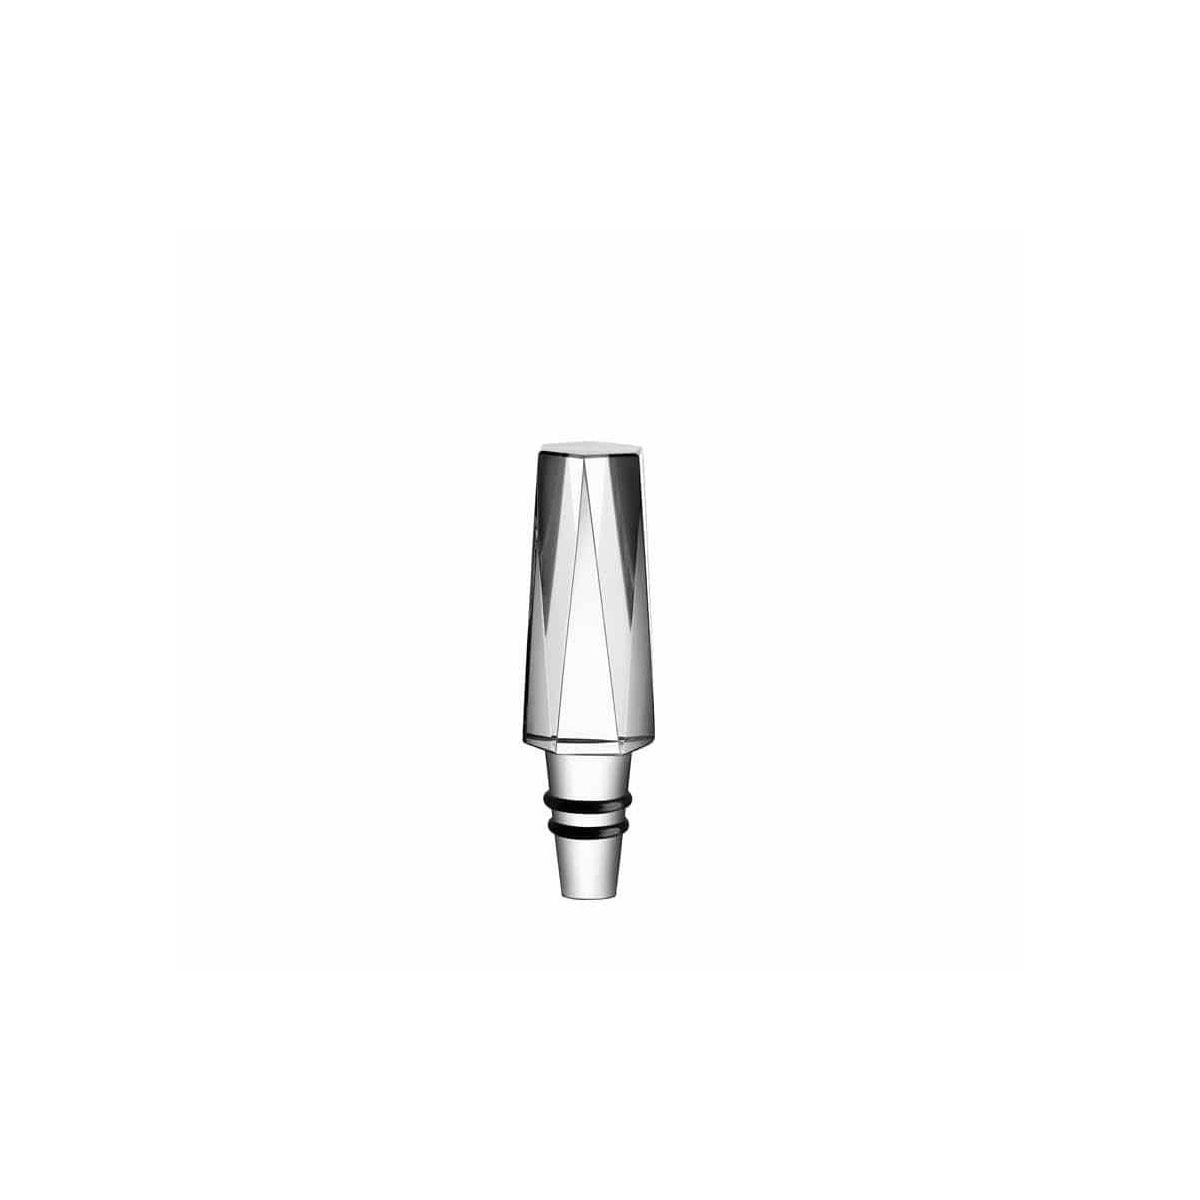 Orrefors Crystal, Sarek City Crystal Wine Bottle Stopper